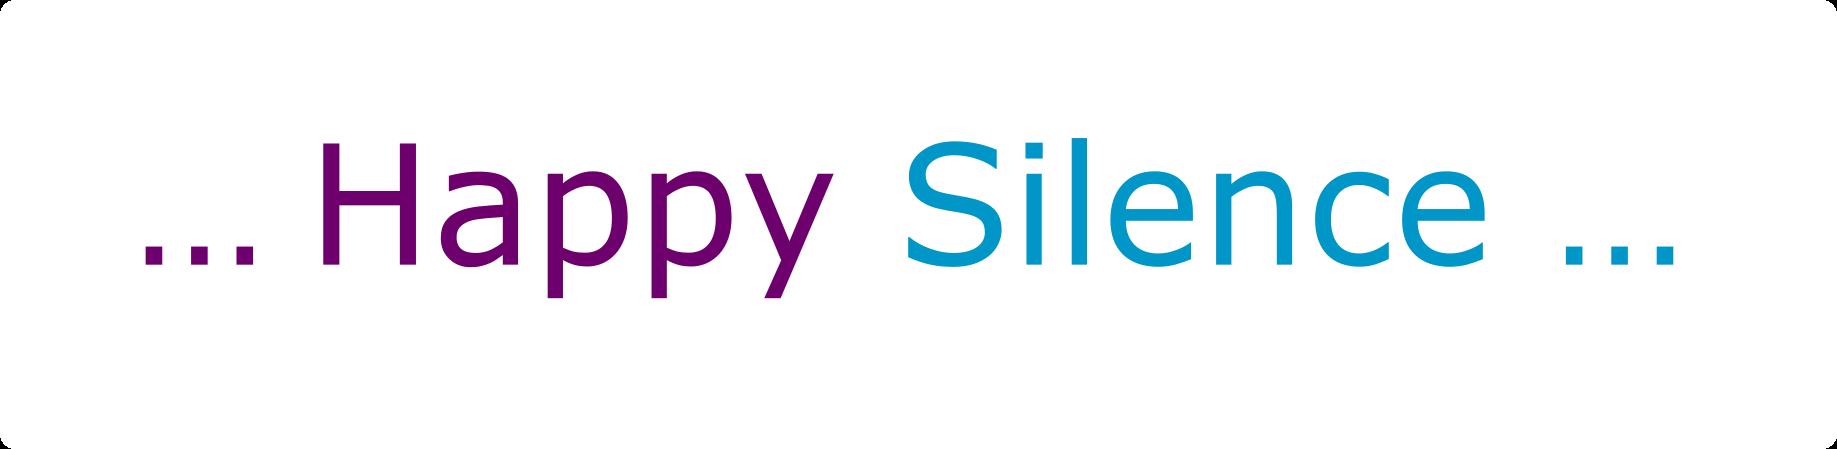 Happy Silence